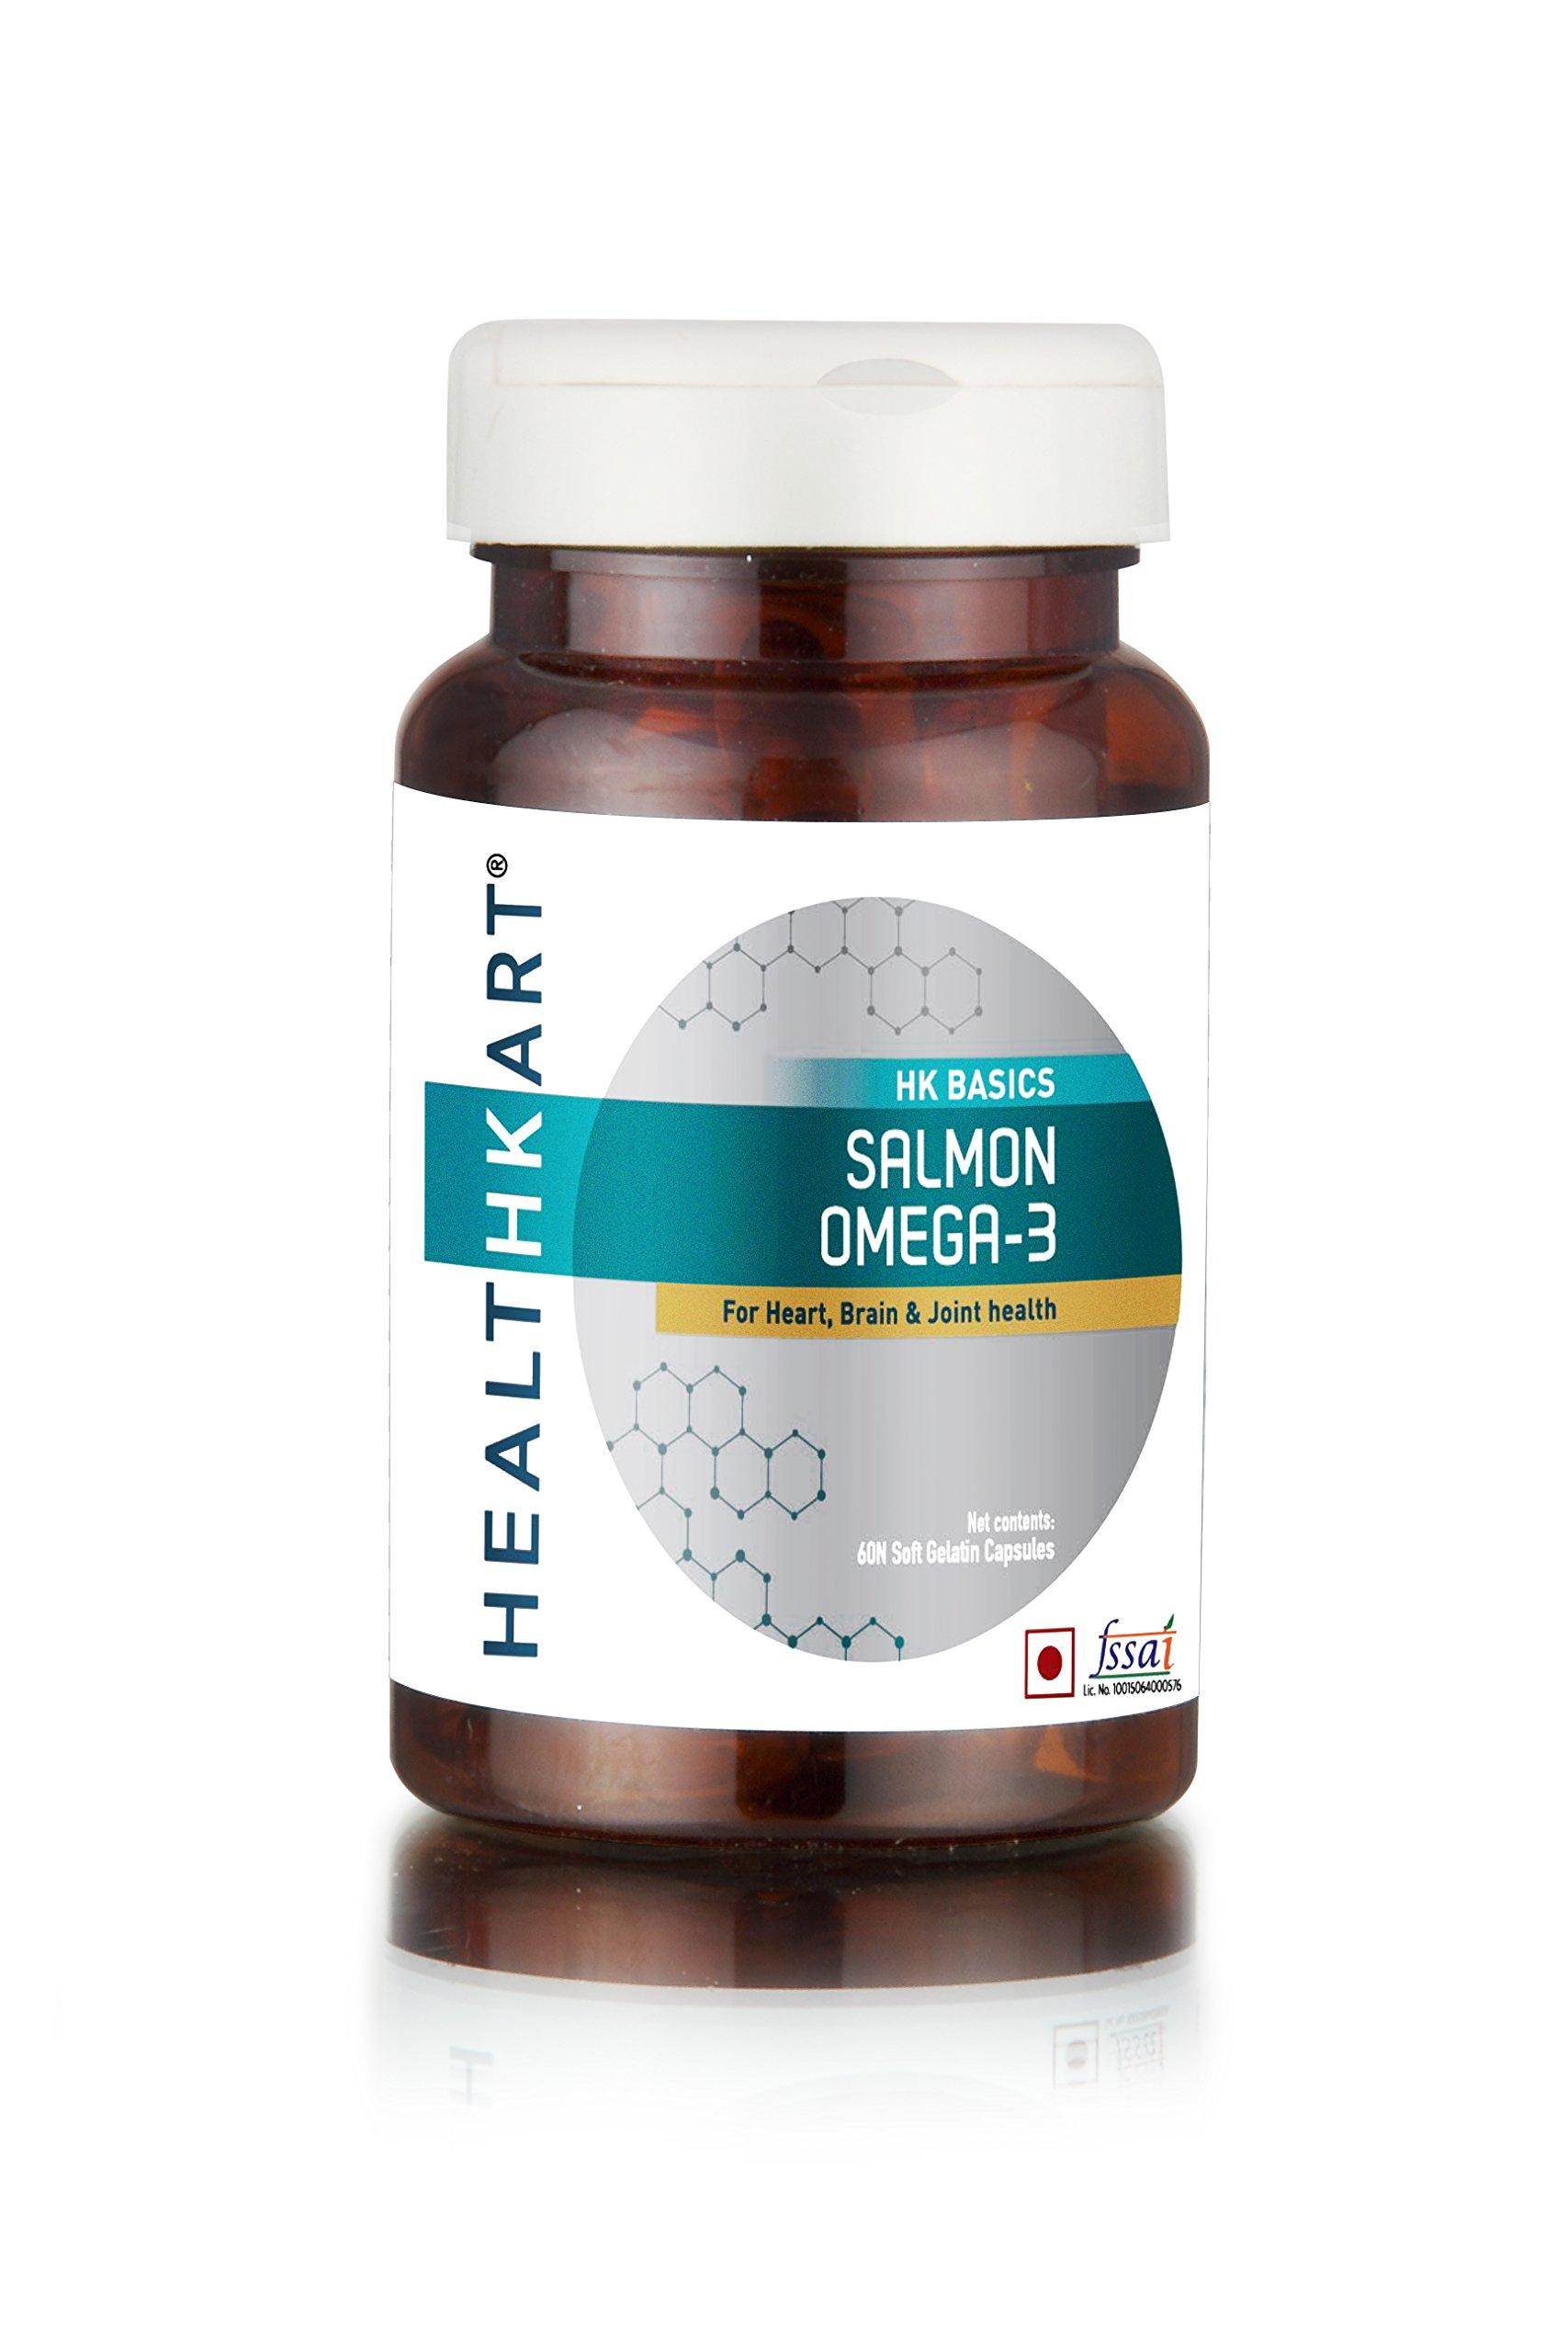 HealthKart Salmon Omega-3, 1000mg - 60 Capsules product image